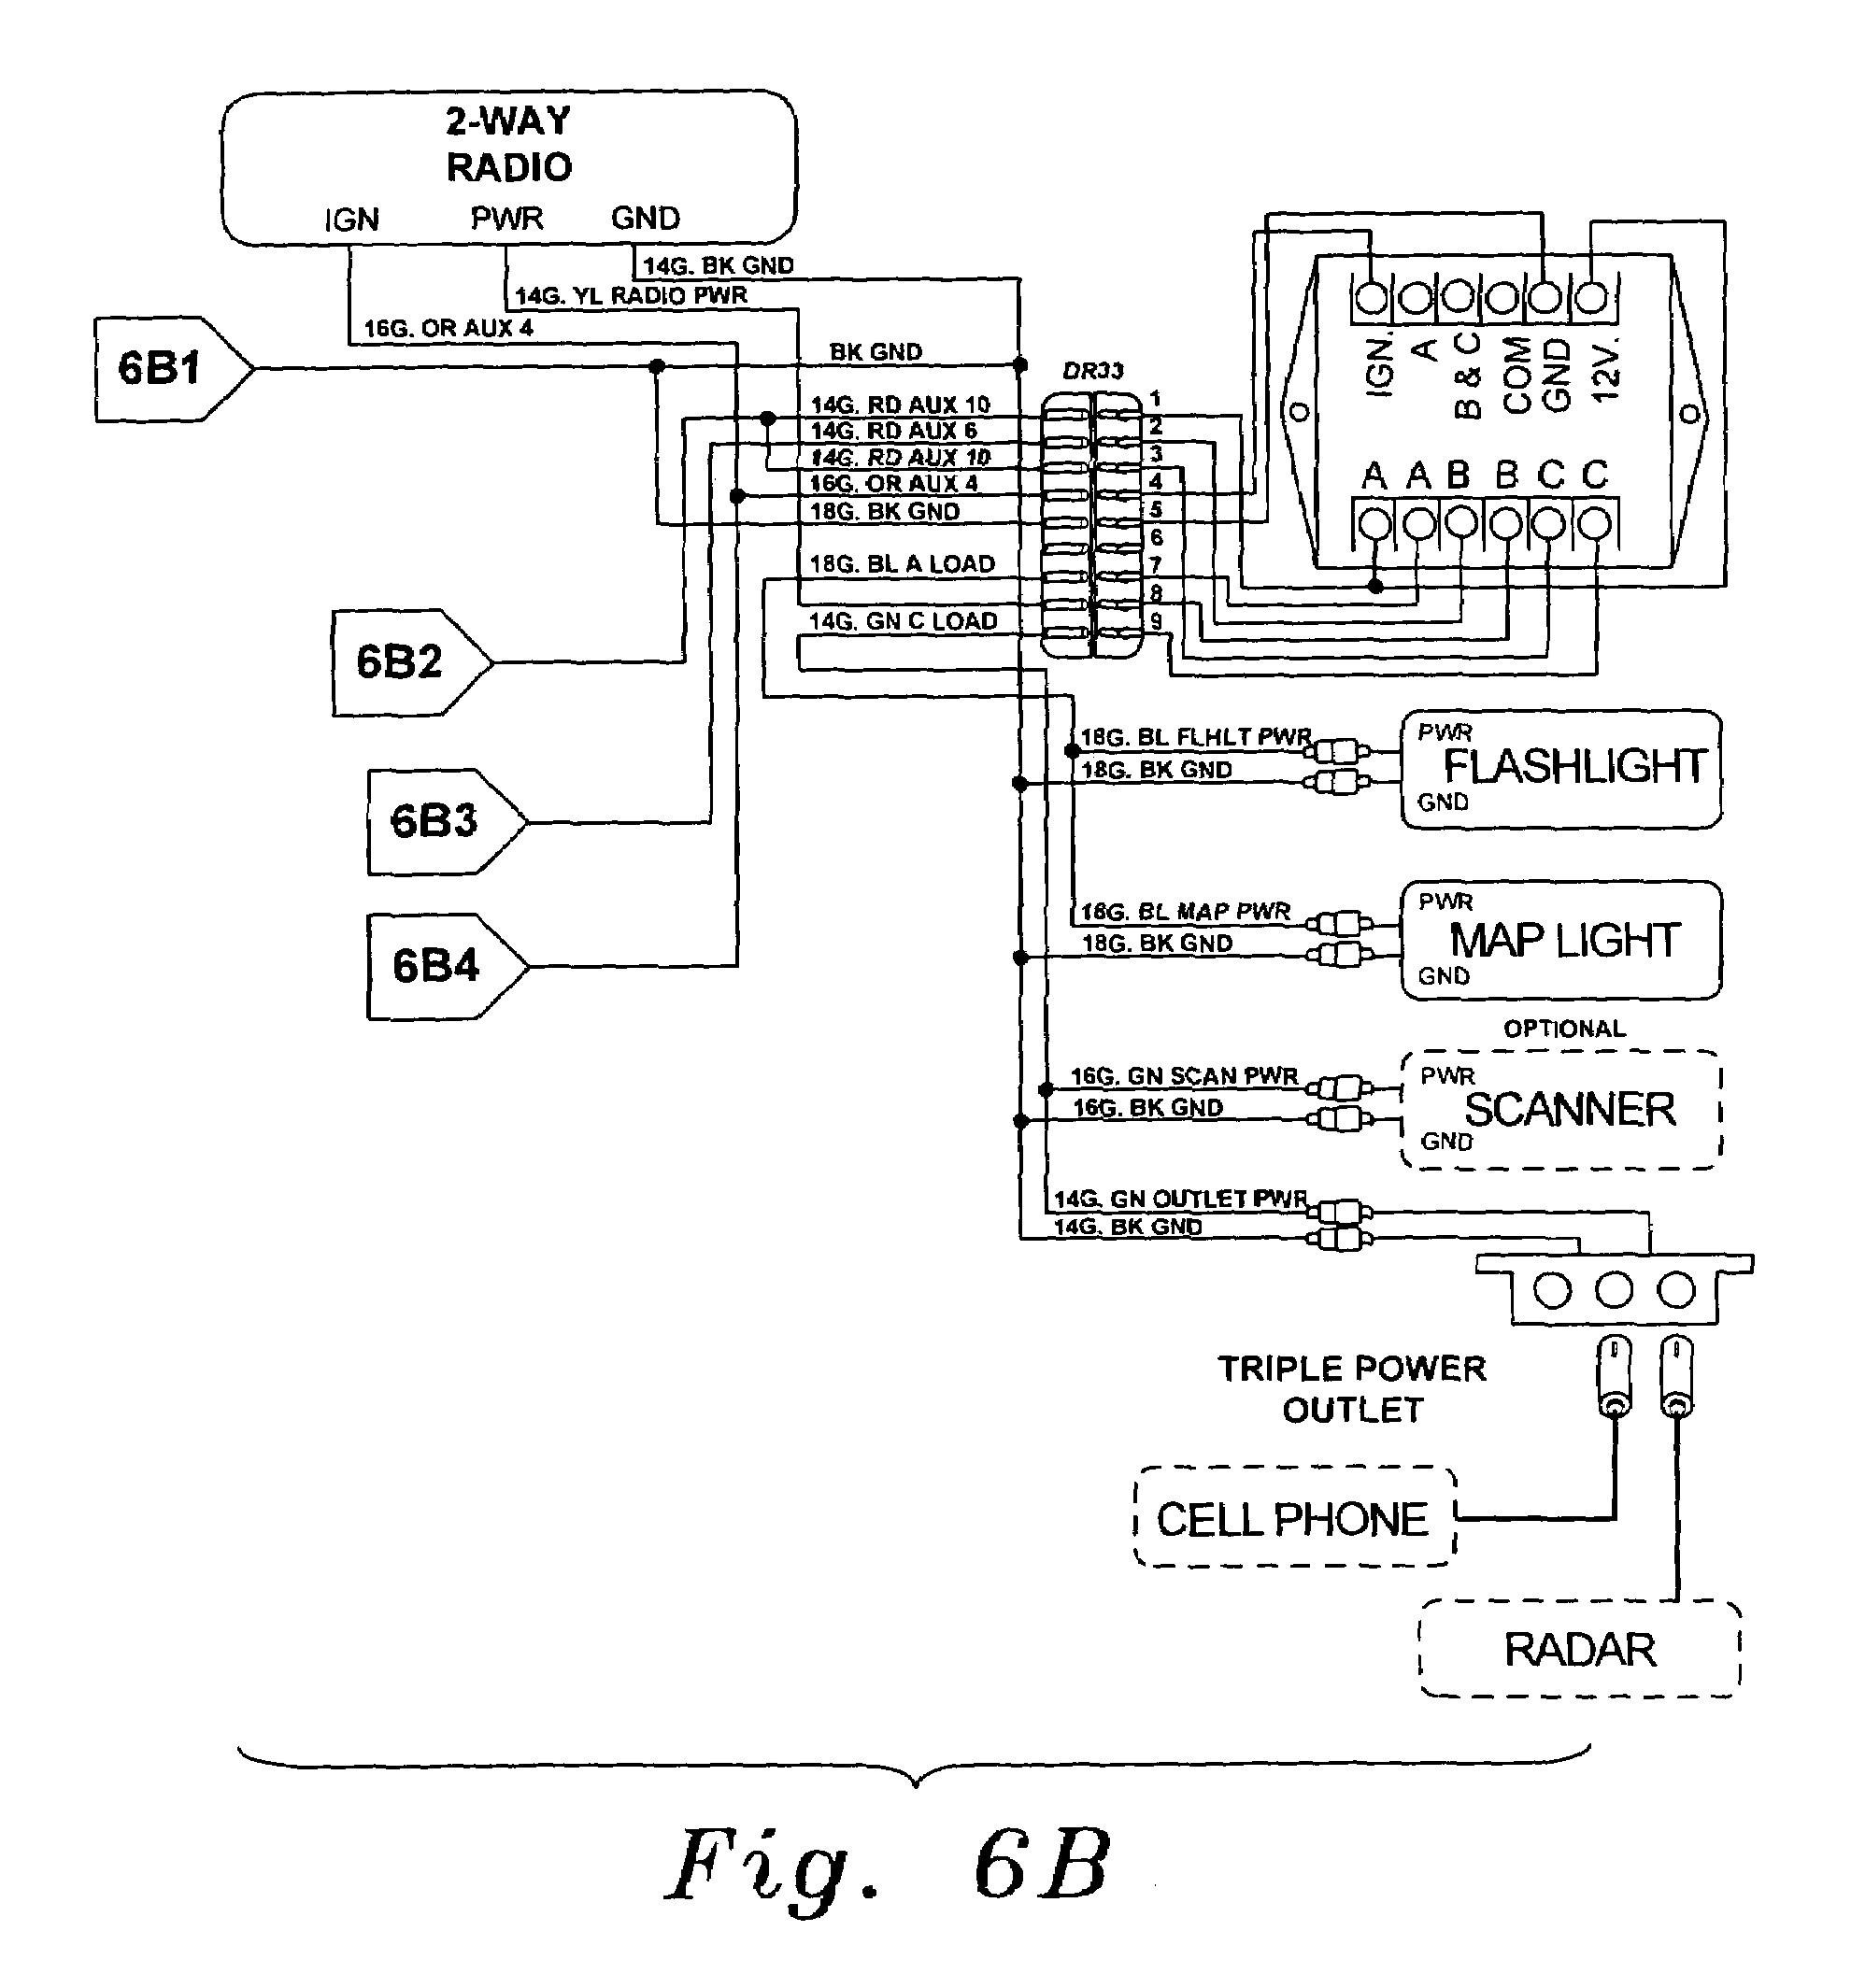 wiring diagram for whelen edge 9m simple guide about whelen light bar controller wiring diagram whelen cs240 wiring